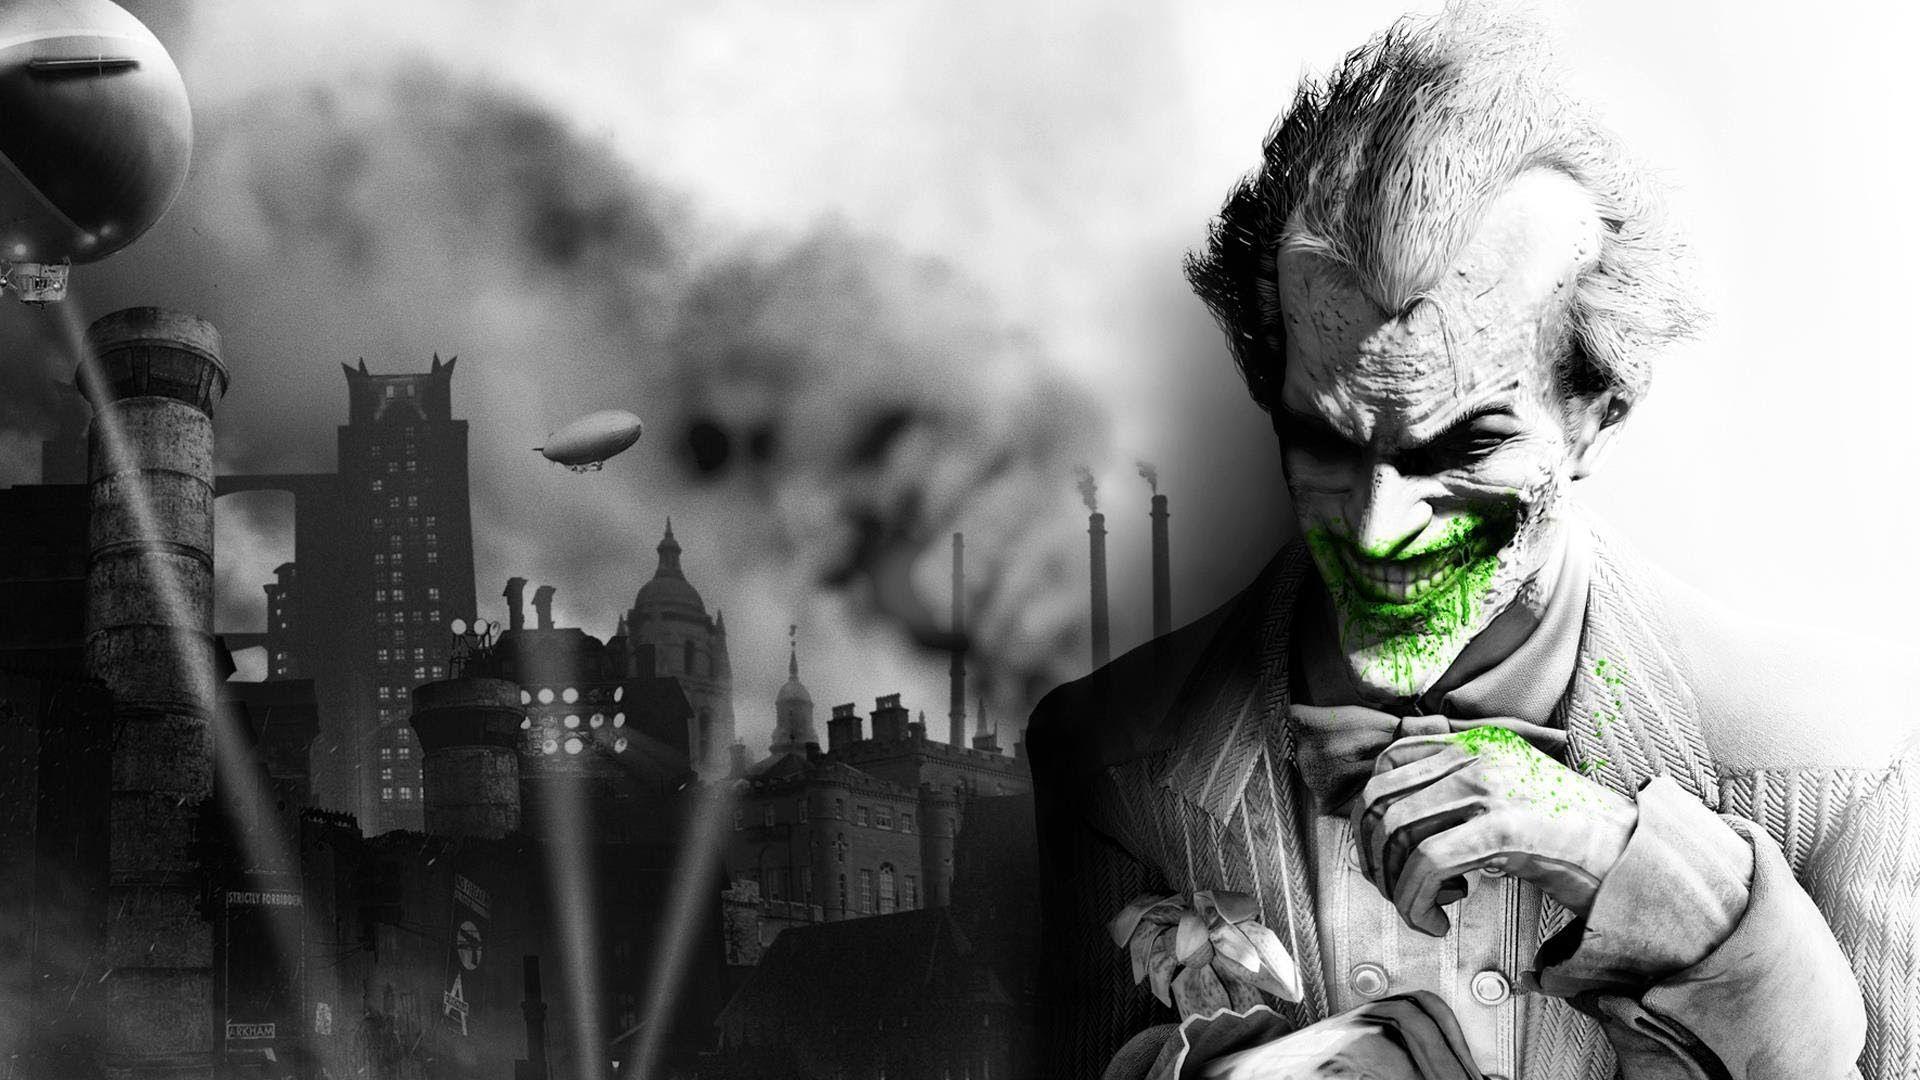 Joker Backgrounds - Wallpaper Cave